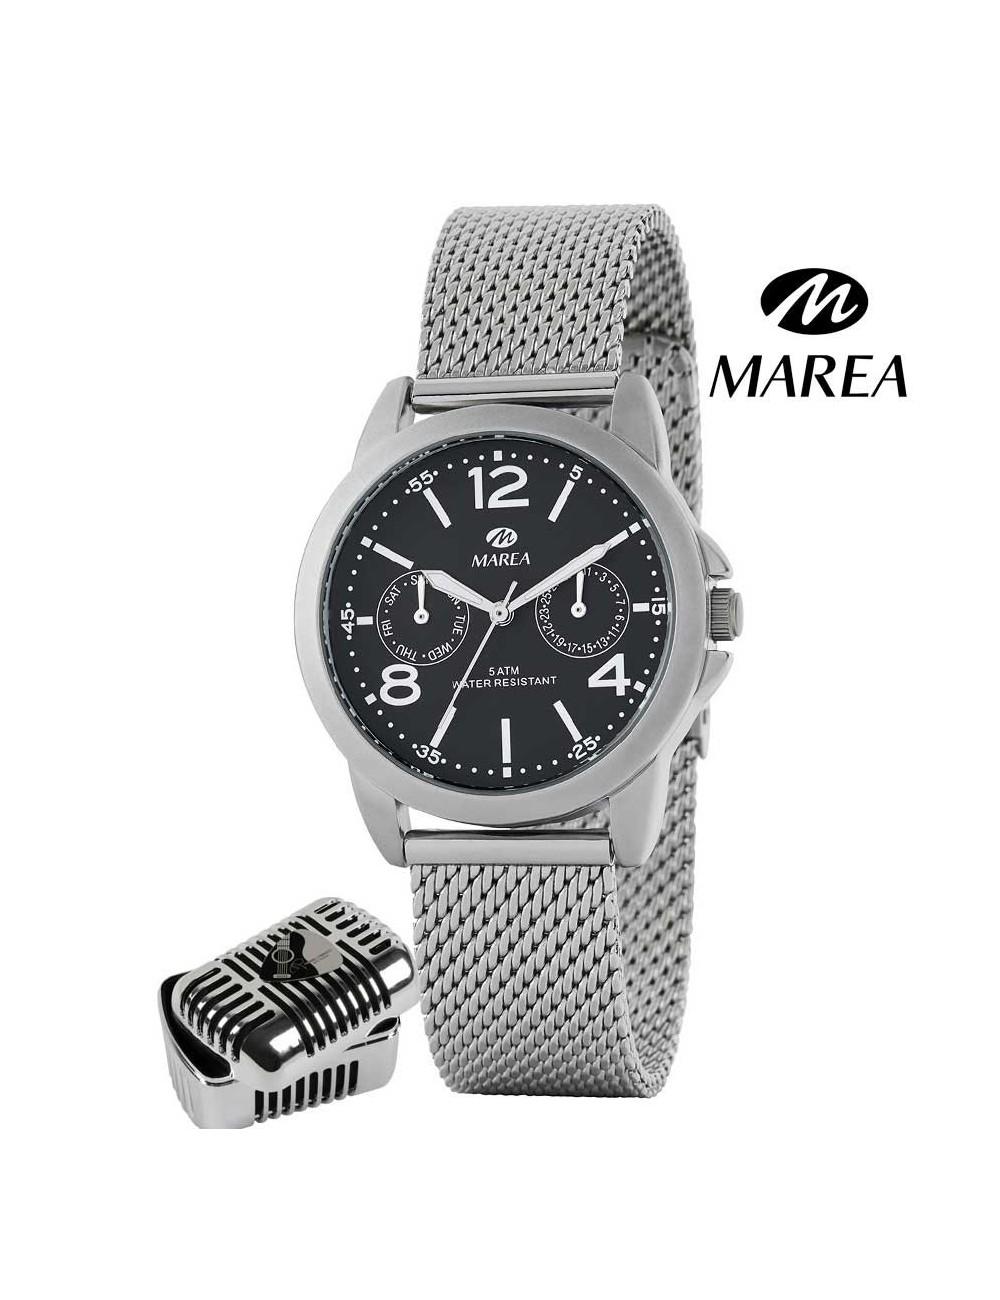 reloj-marea-manuel-carrasco-cadena-malla-multifuncion-mujer-b41223-2-esfera-negra